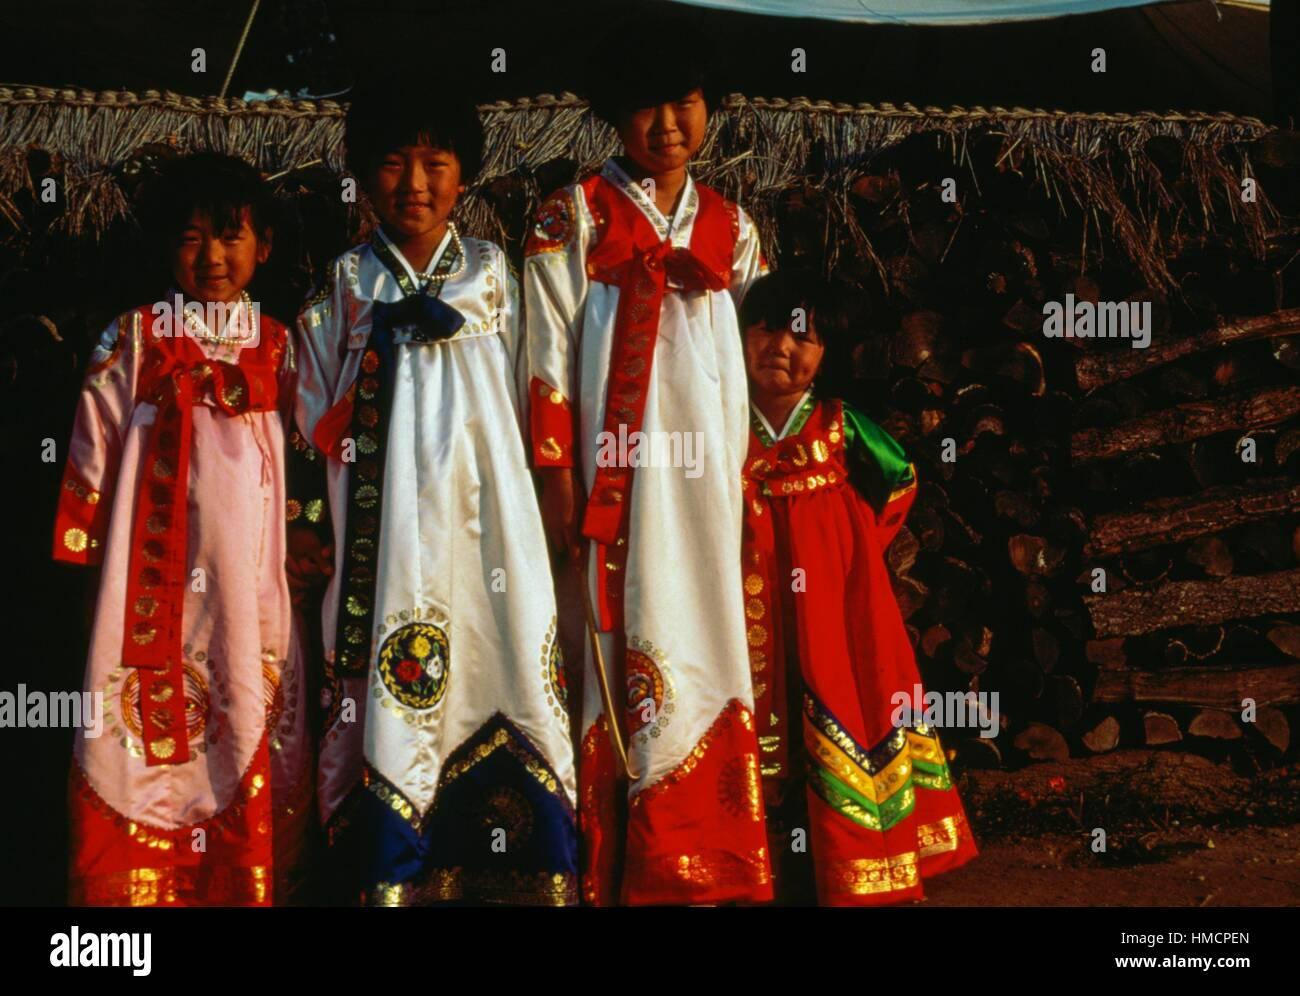 Girls wearing traditional dresses, South Korea. - Stock Image